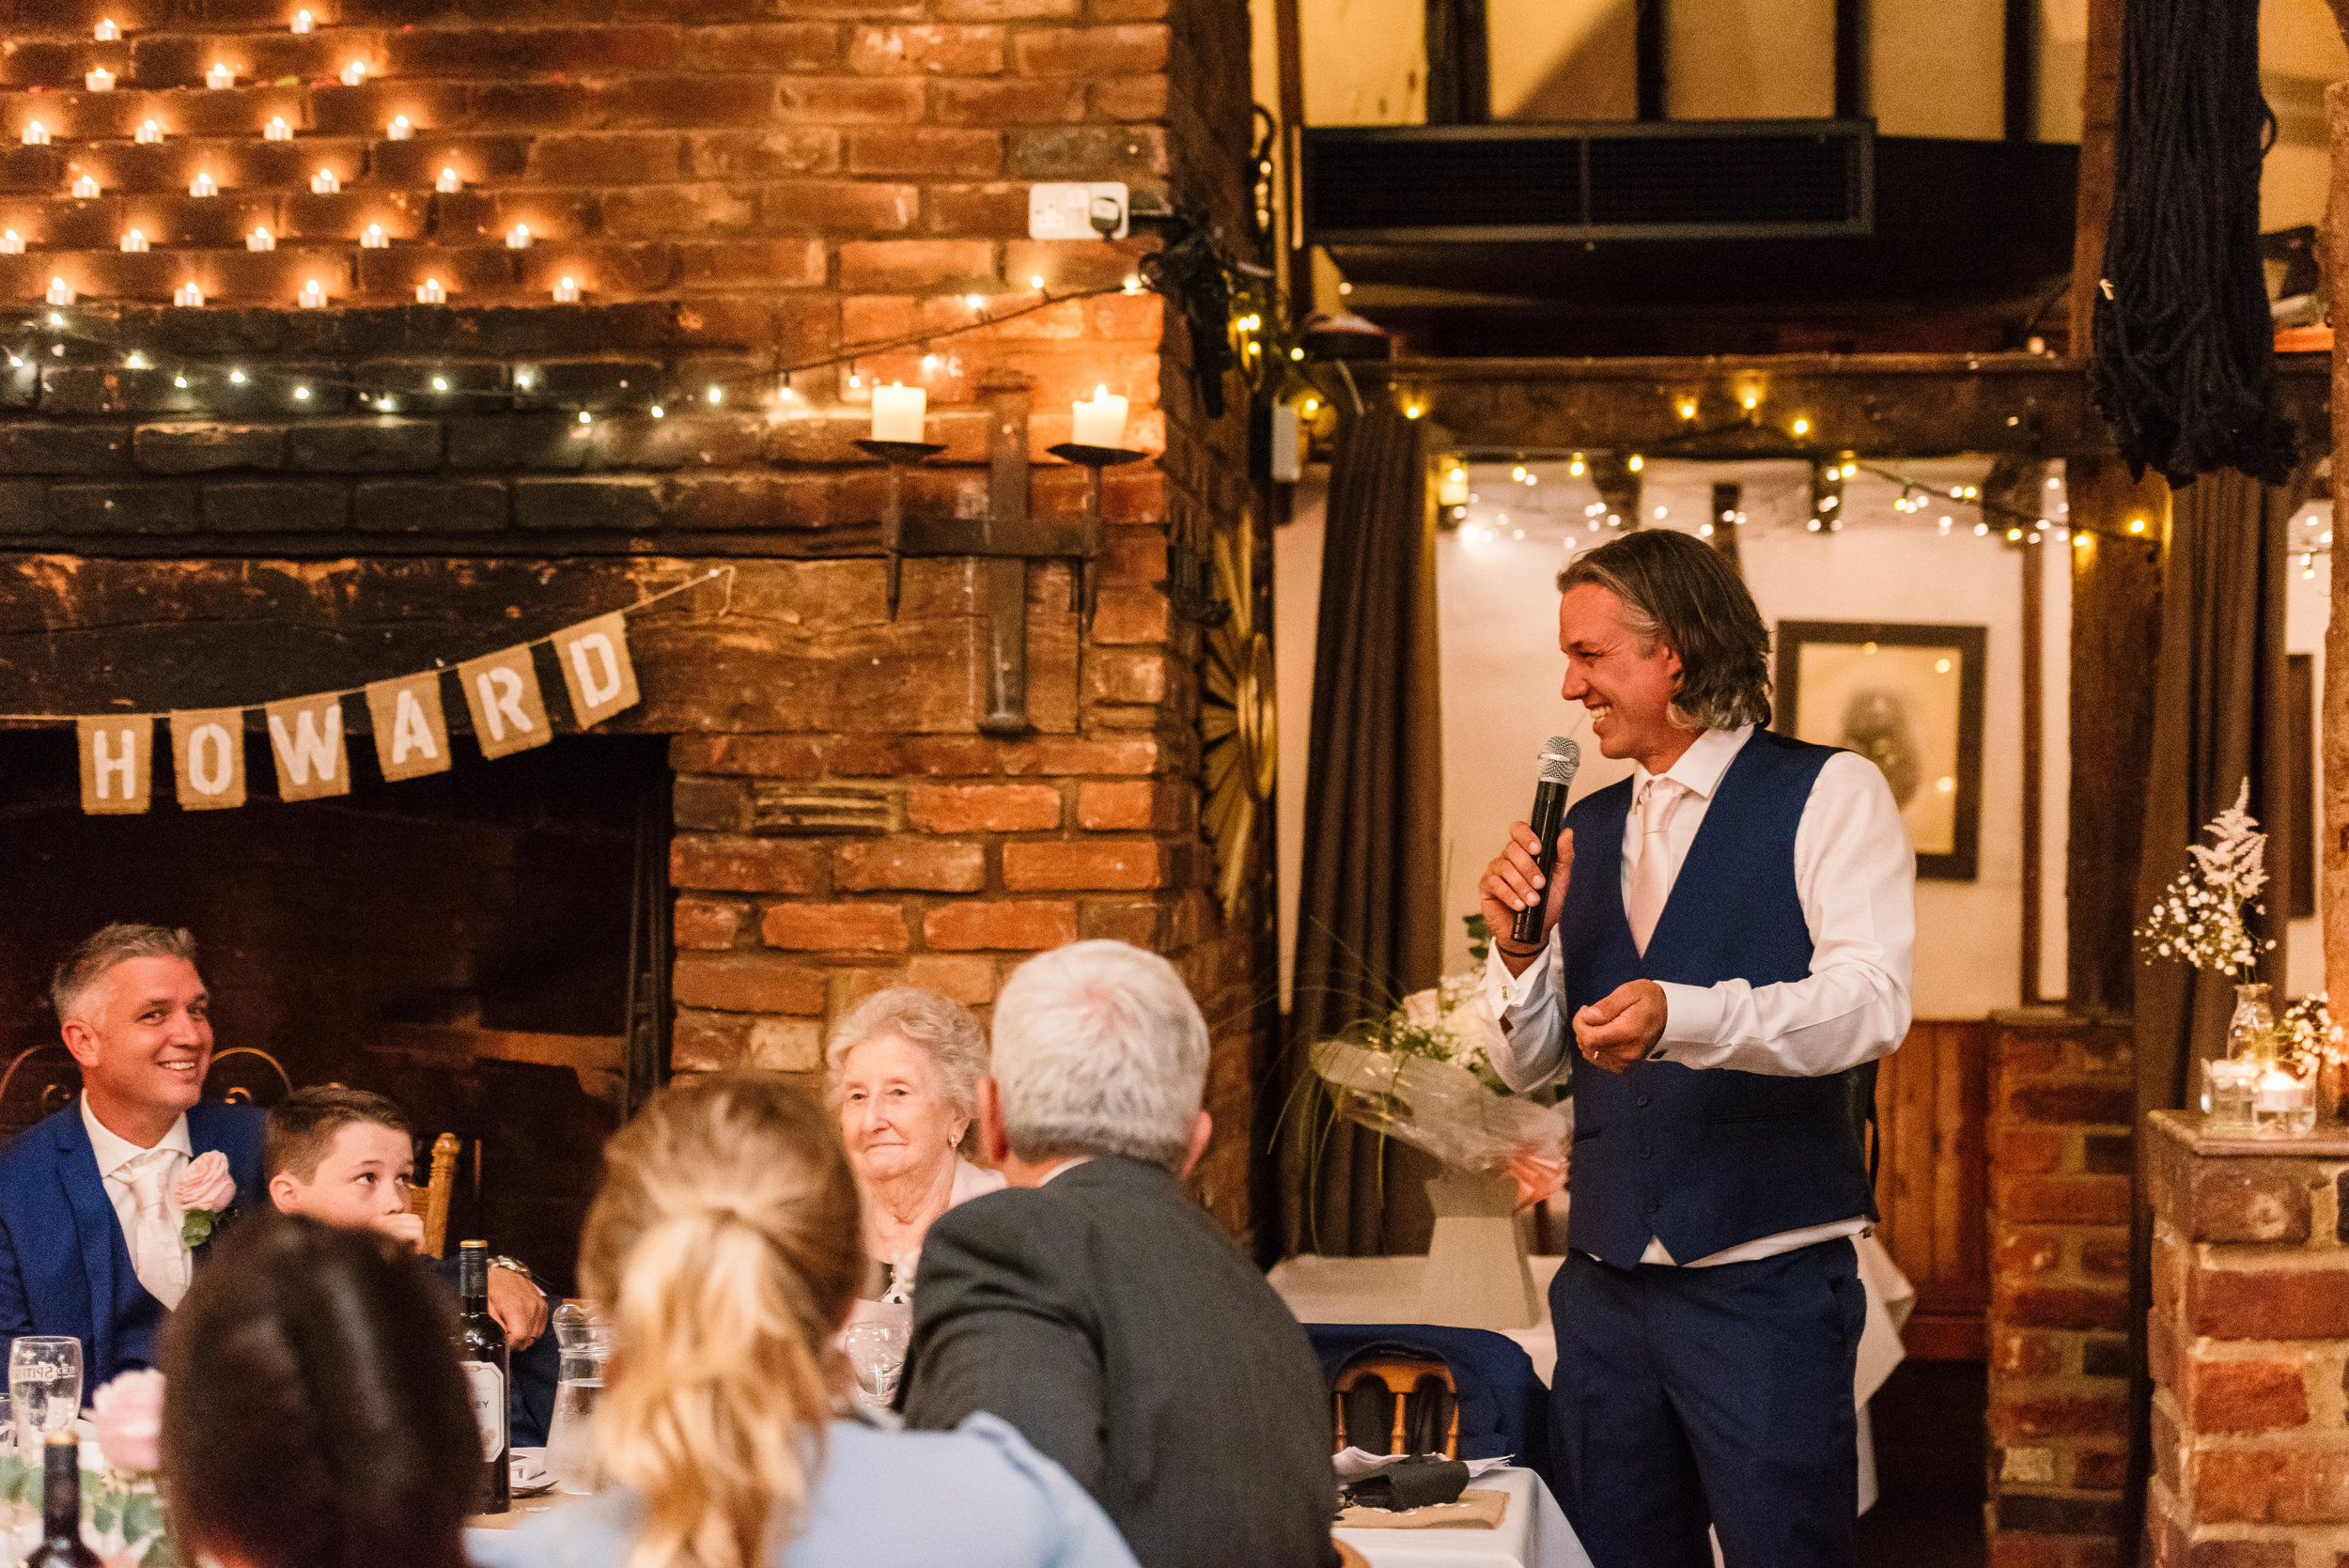 Sarah-Fishlock-Photography : Hampshire-wedding-photographer-hampshire : fleet-wedding-photographer-fleet : Meade-Hall-Wedding-Photographer : Meade-Hall-Wedding-Photos-930.jpg